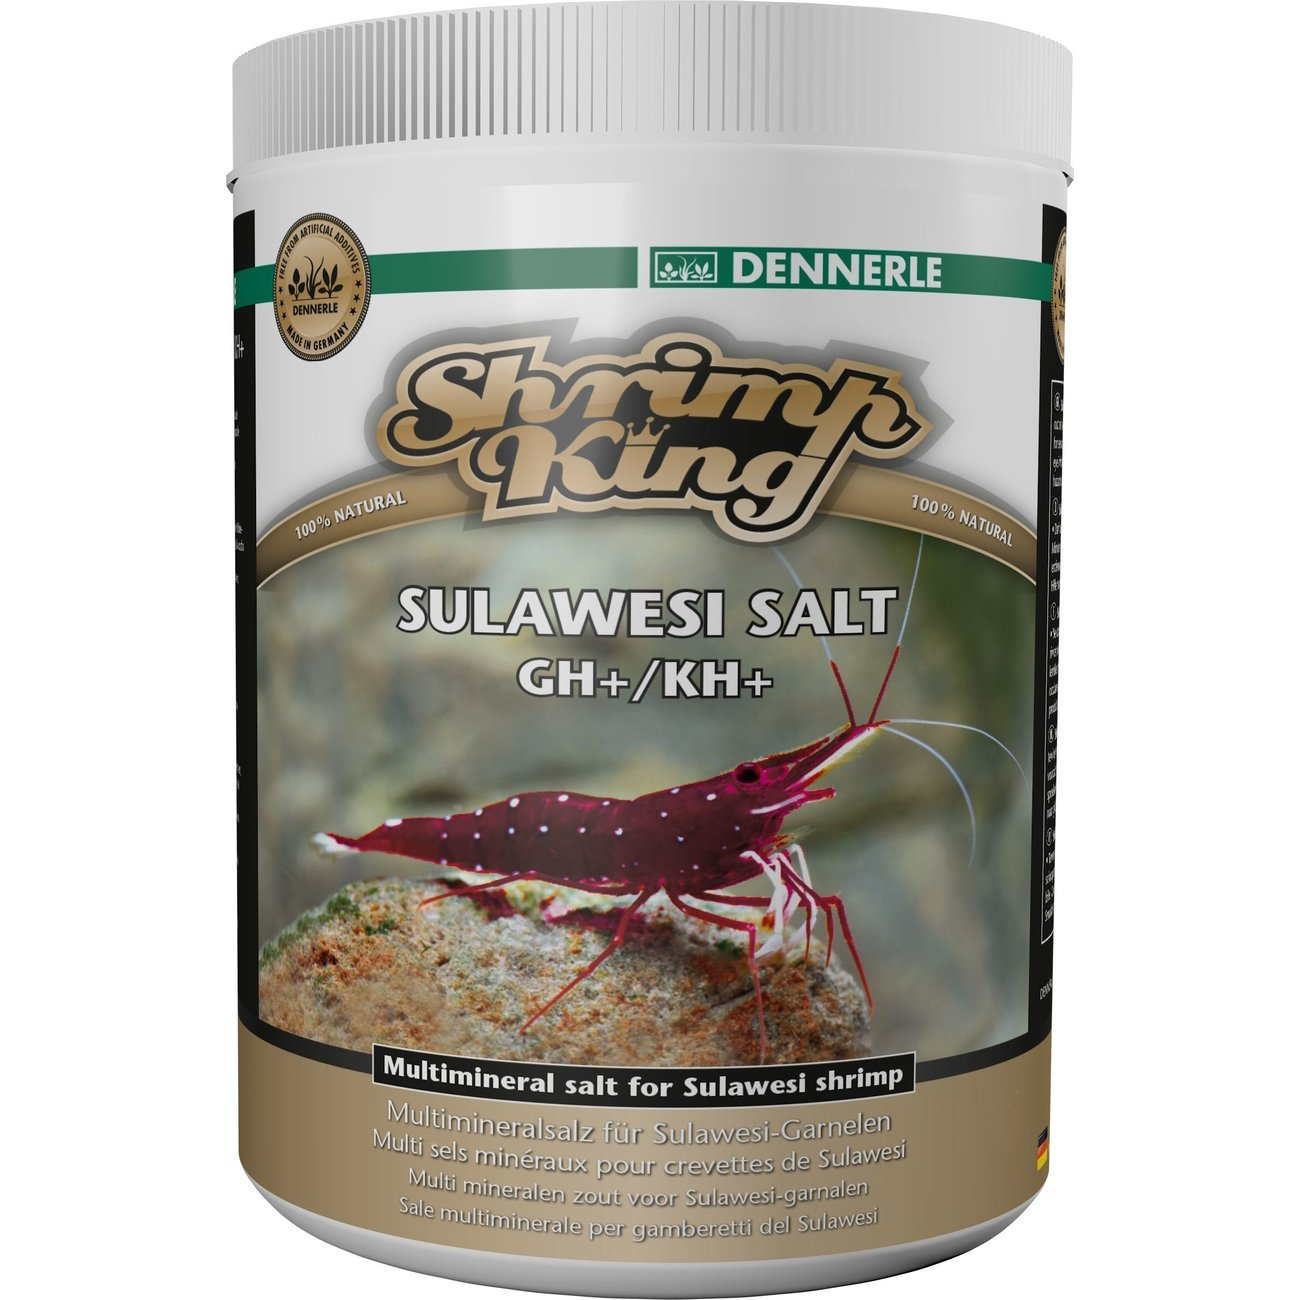 Dennerle Shrimp King Sulawesi Salt GH+/KH+, 1000 Gramm